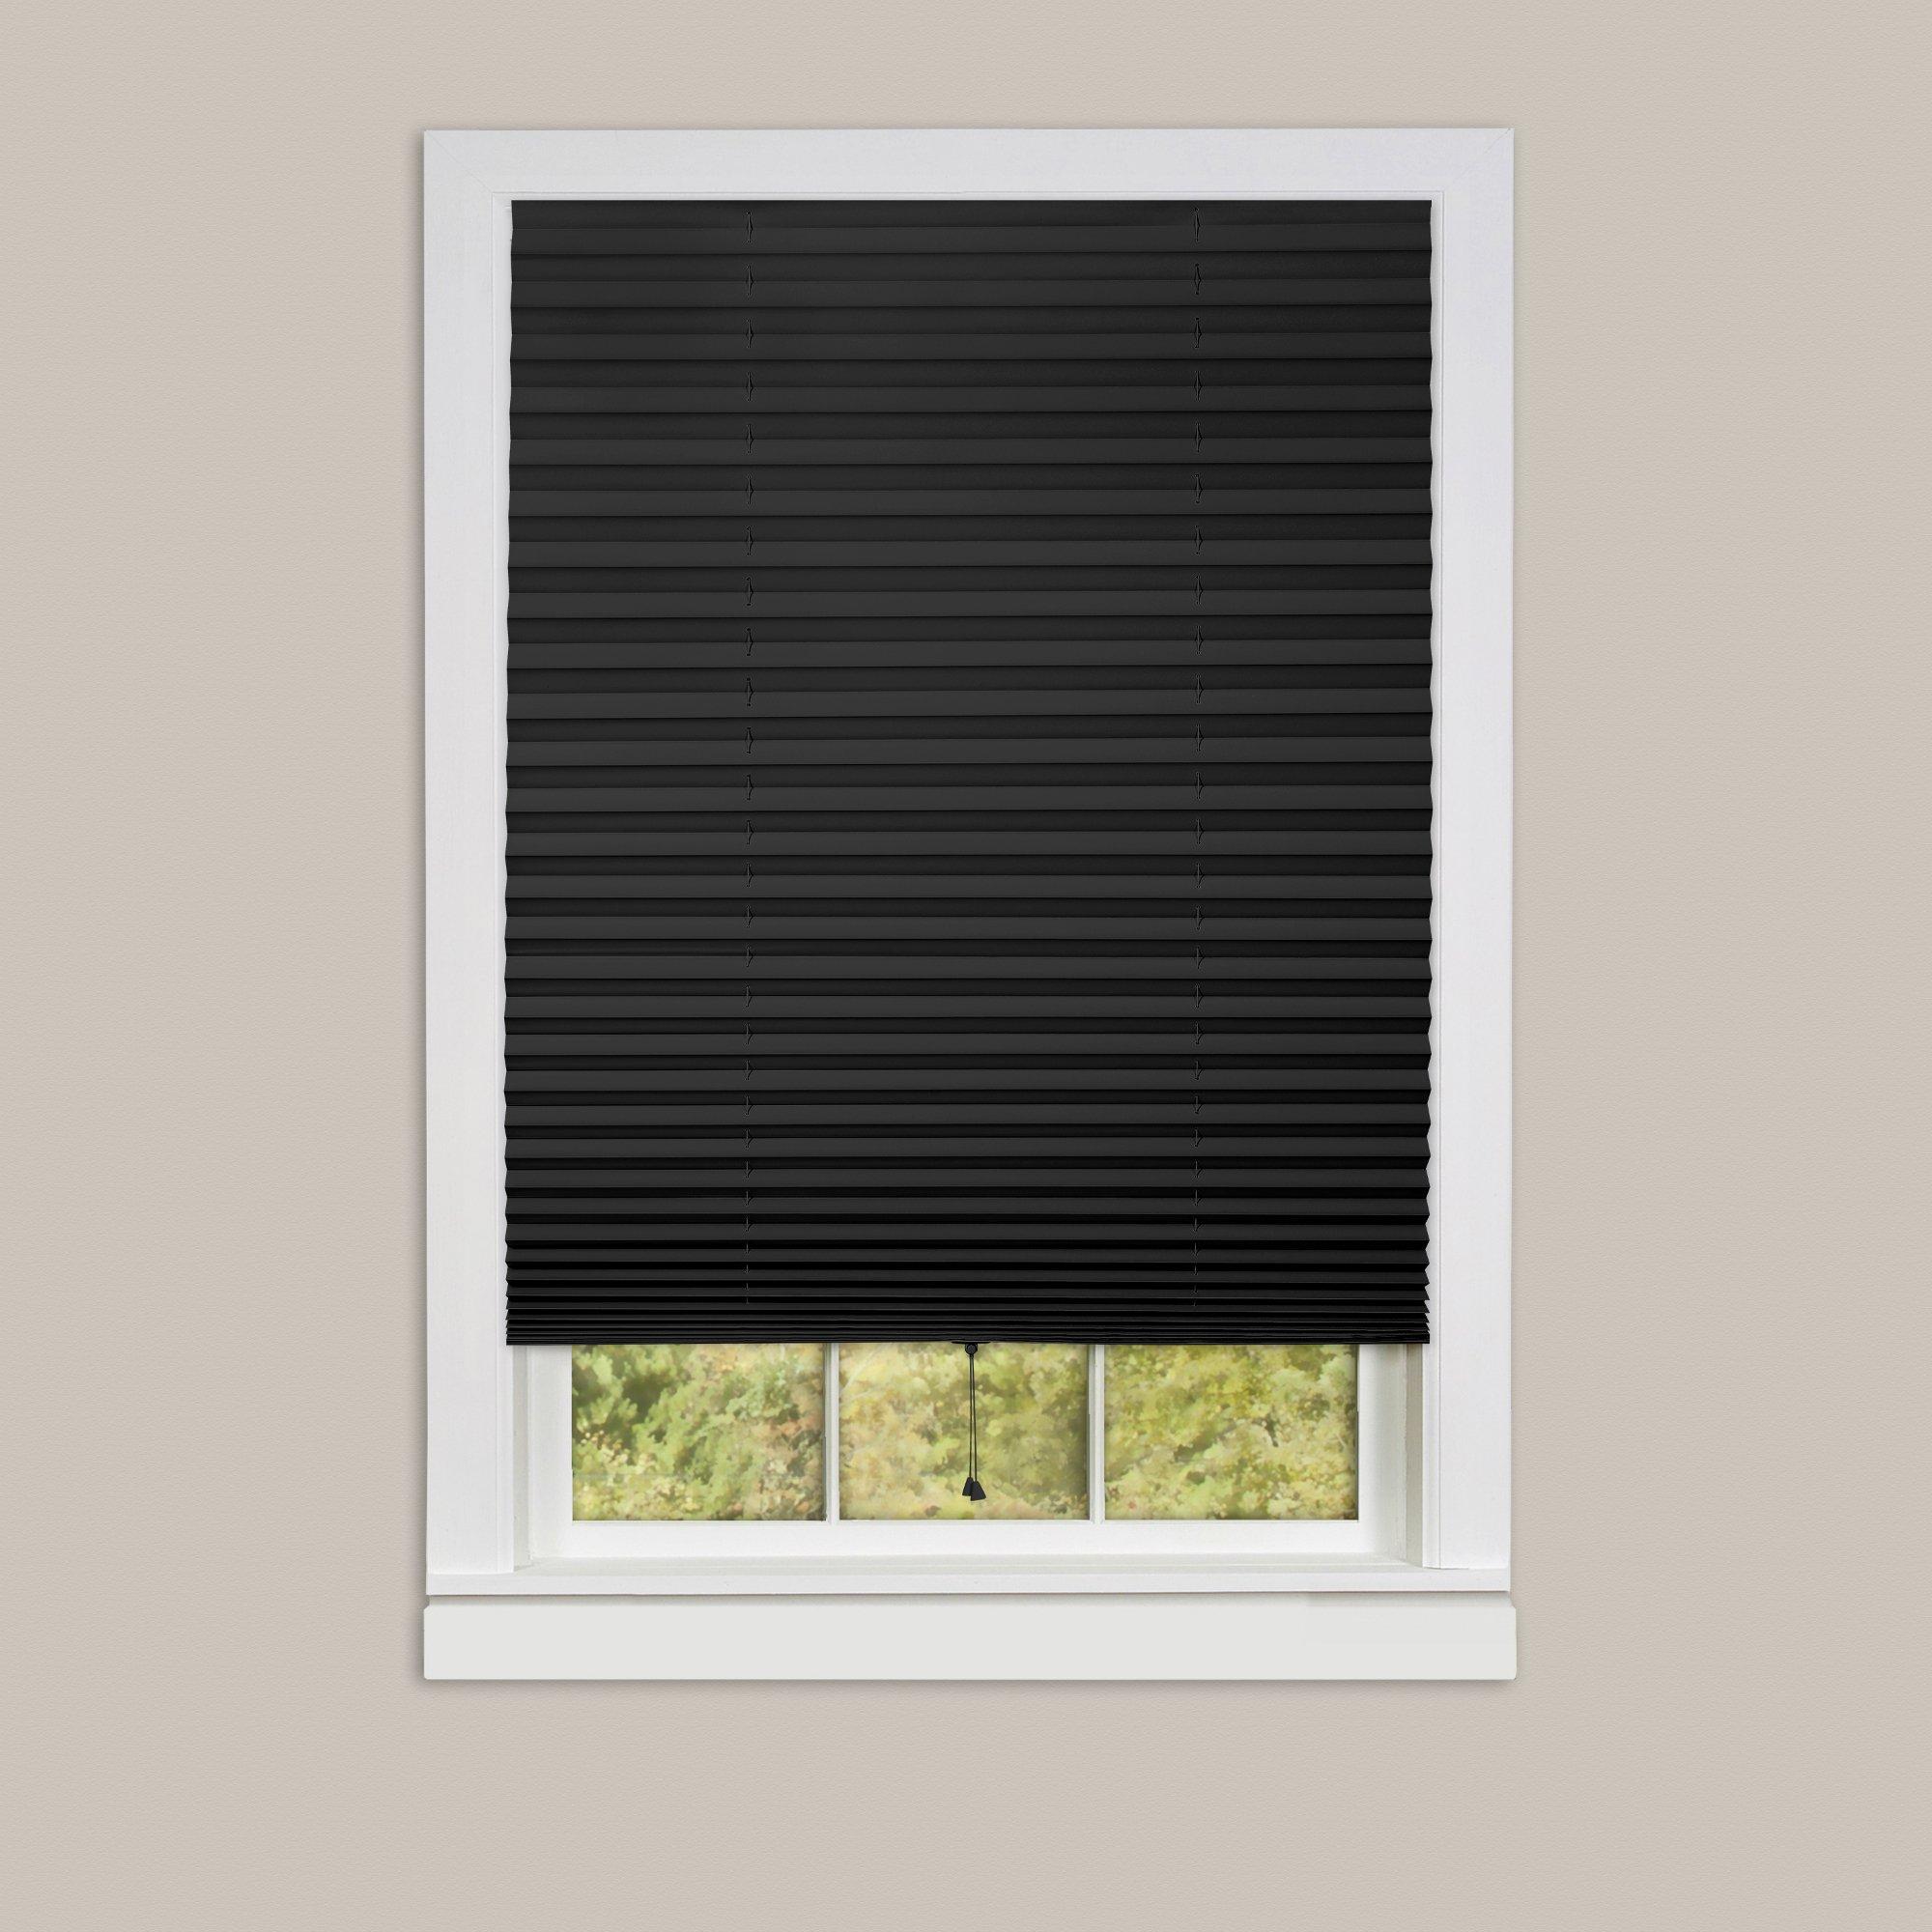 Achim Home Furnishings 1-2-3 Vinyl Room Darkening Temporary Pleated Window Shade, 48'' X 75'', black, 48 X 75